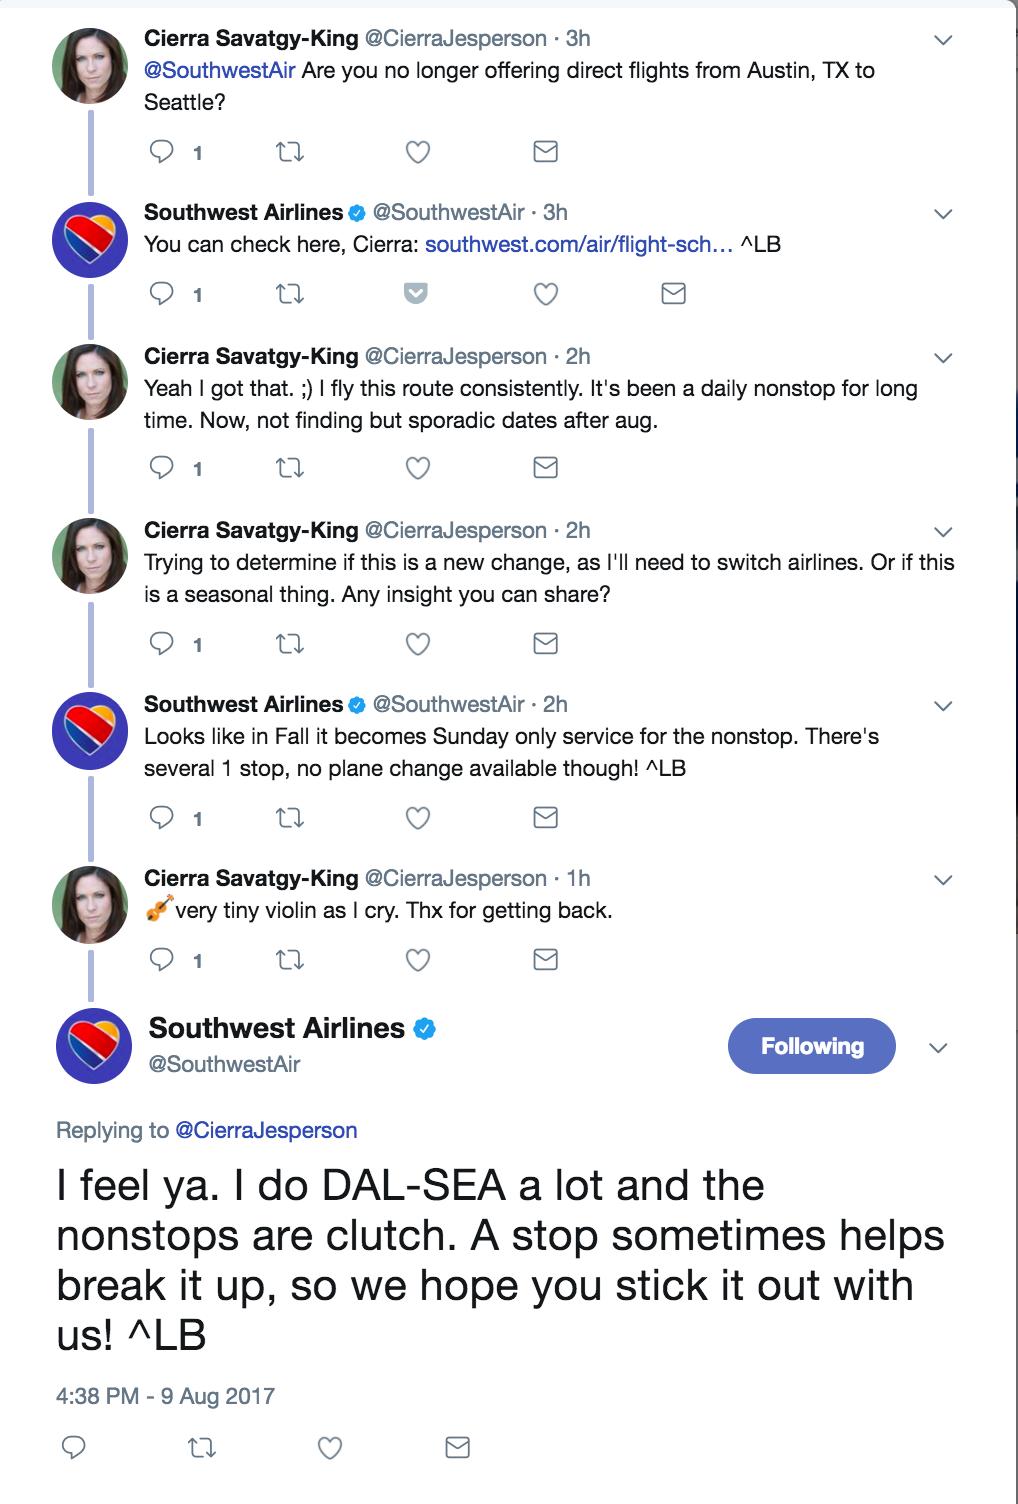 Customer feedback on Twitter